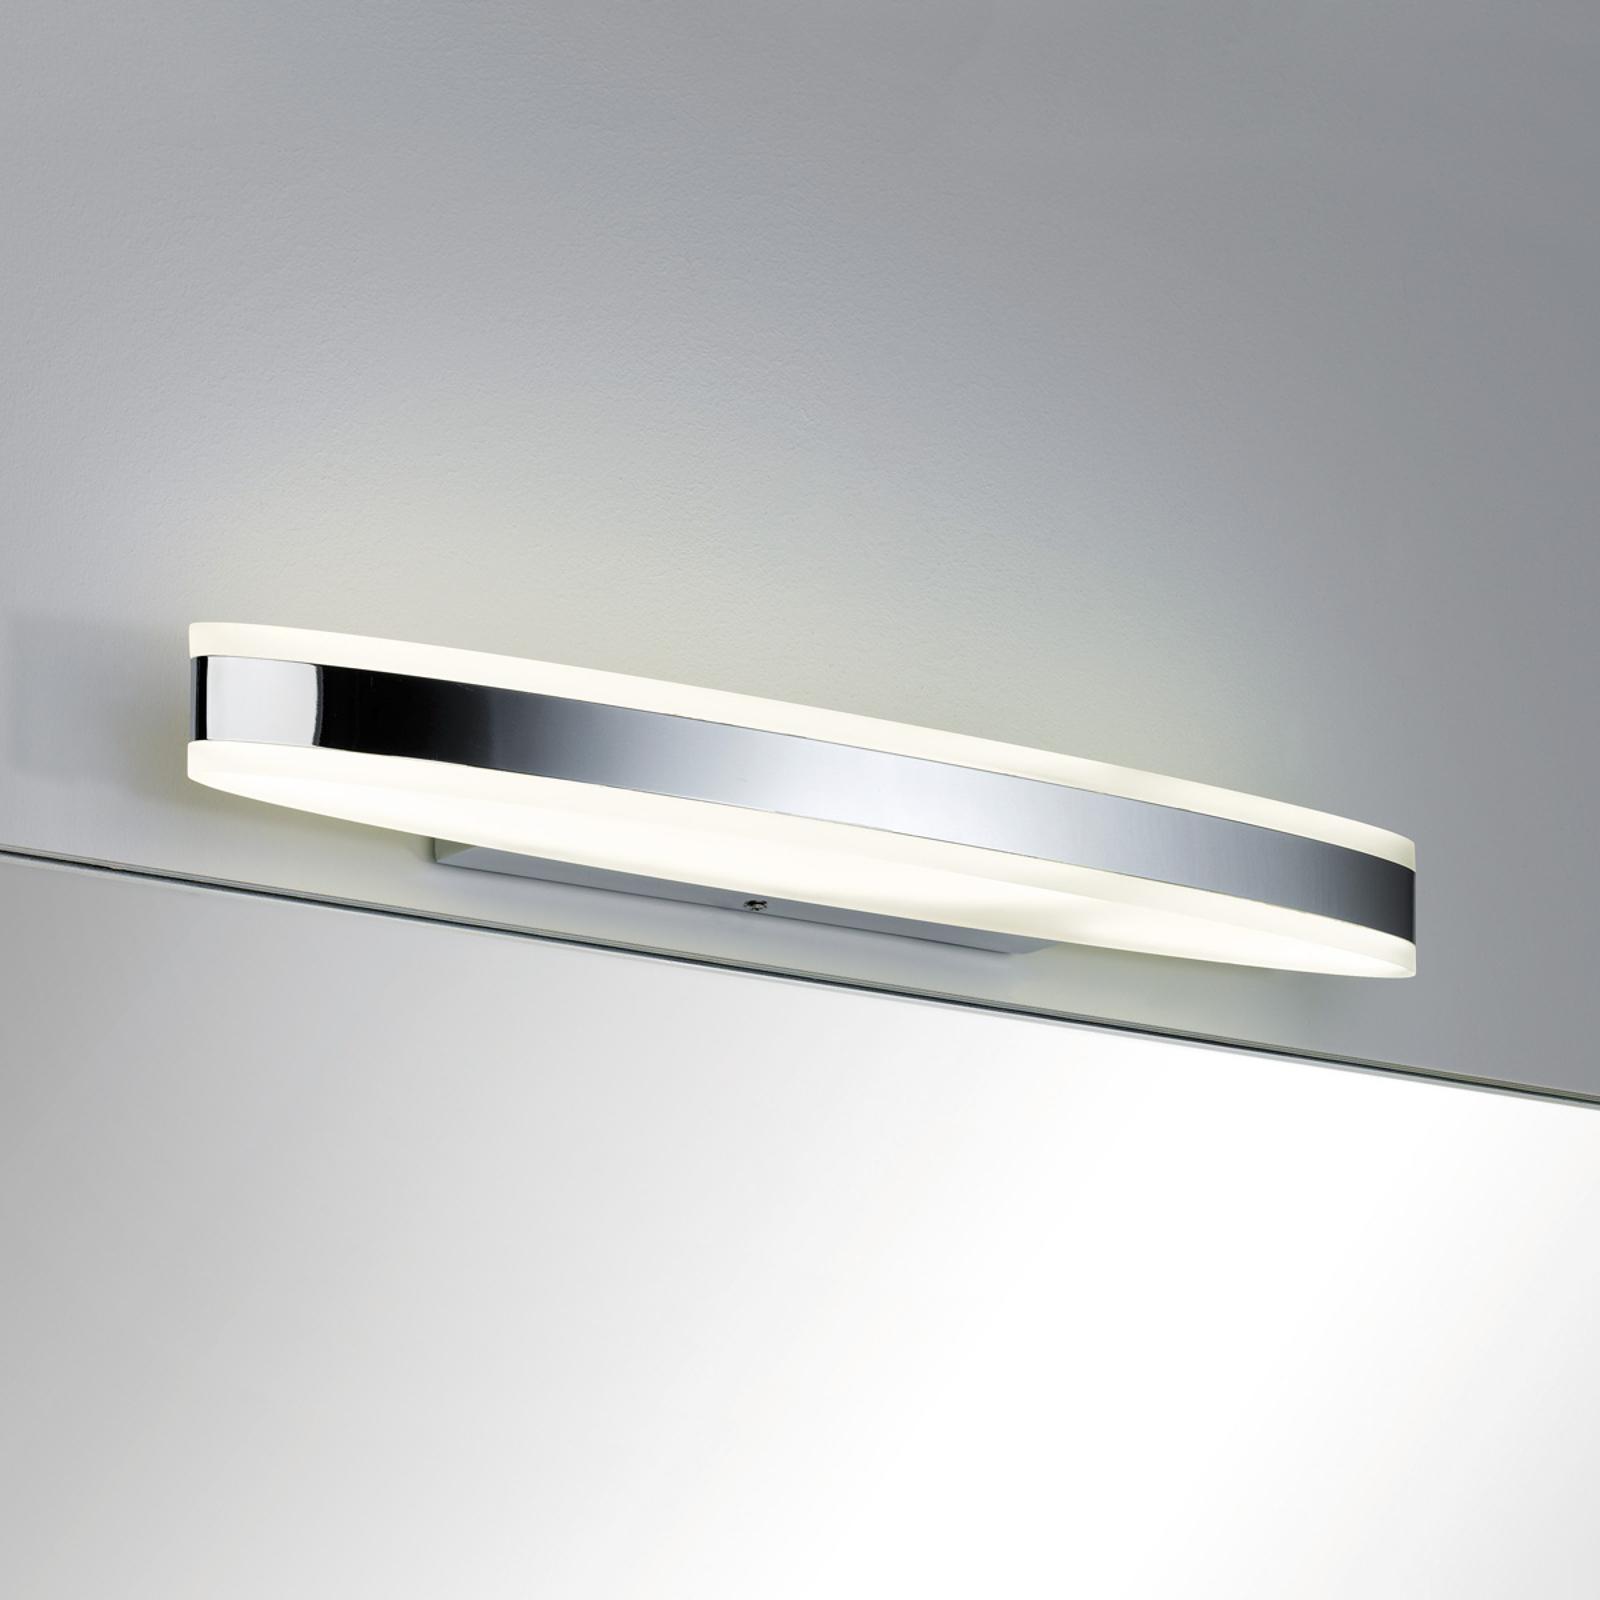 Langwerpige LED wandlamp Kuma